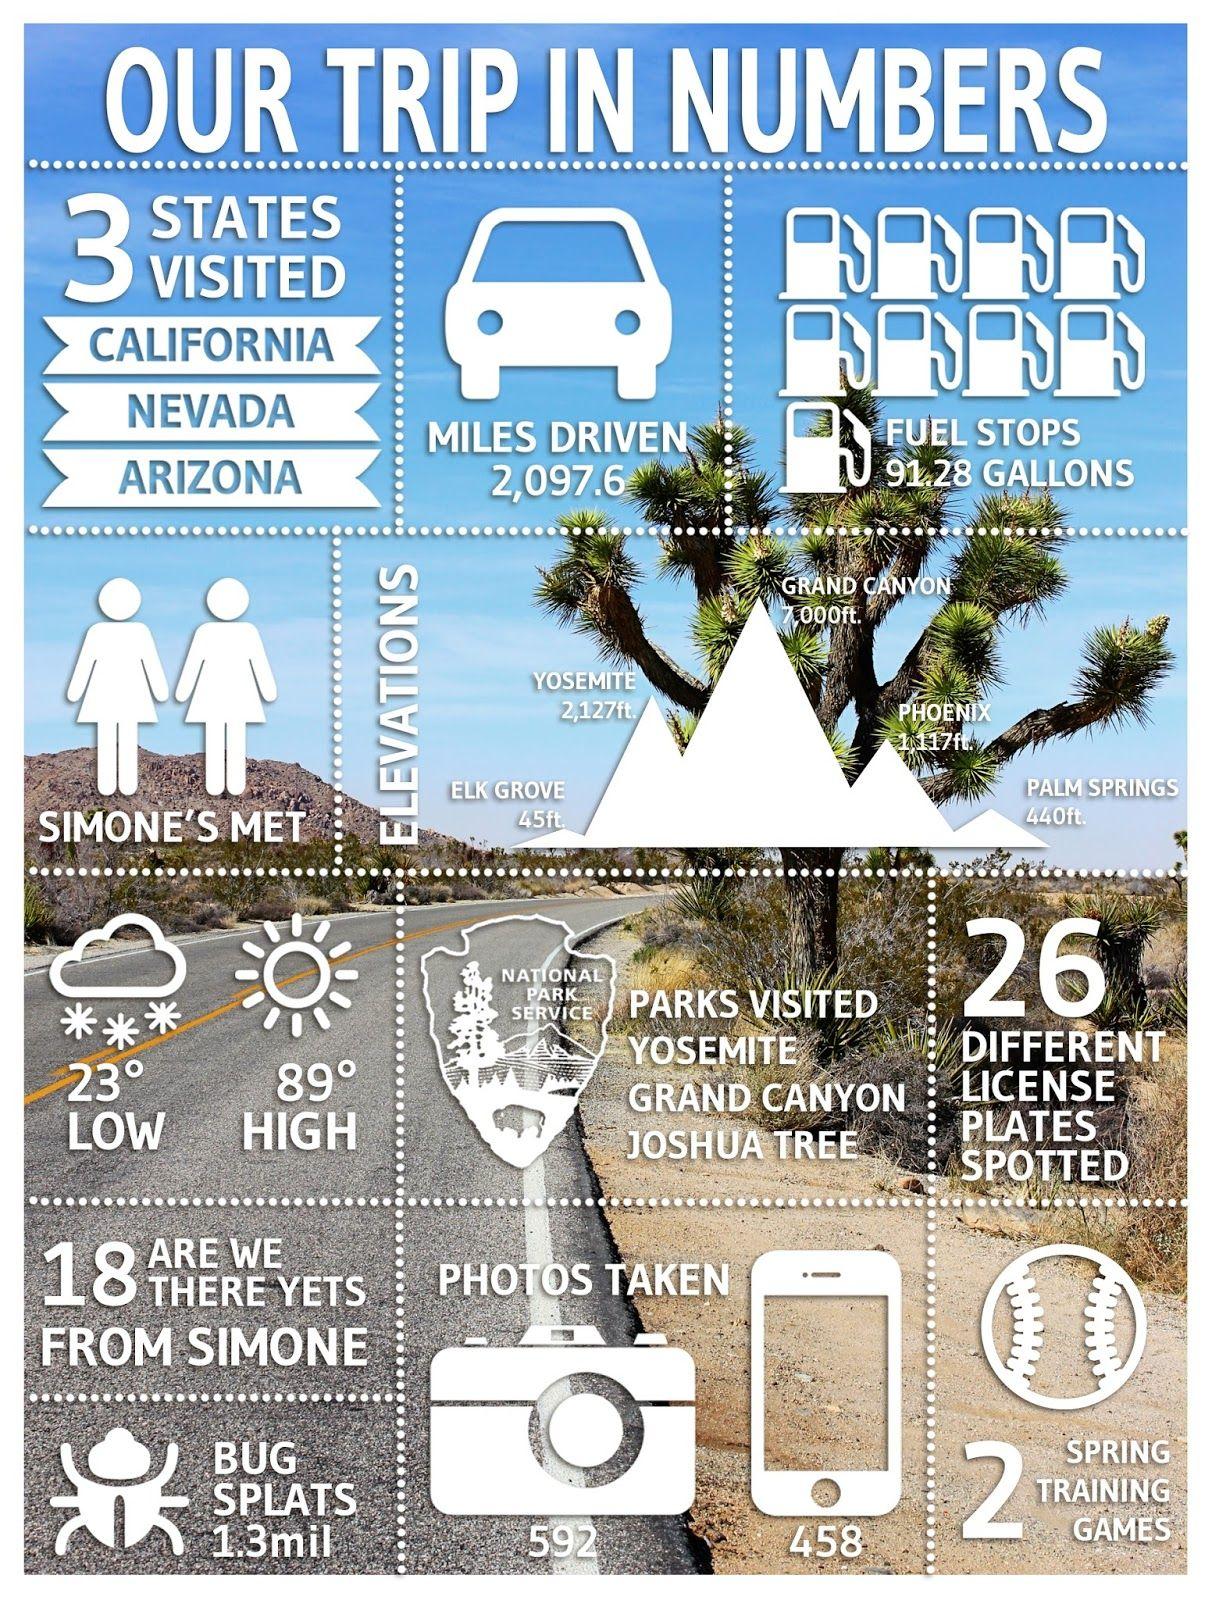 infographic design | photoshop tutorials - YouTube